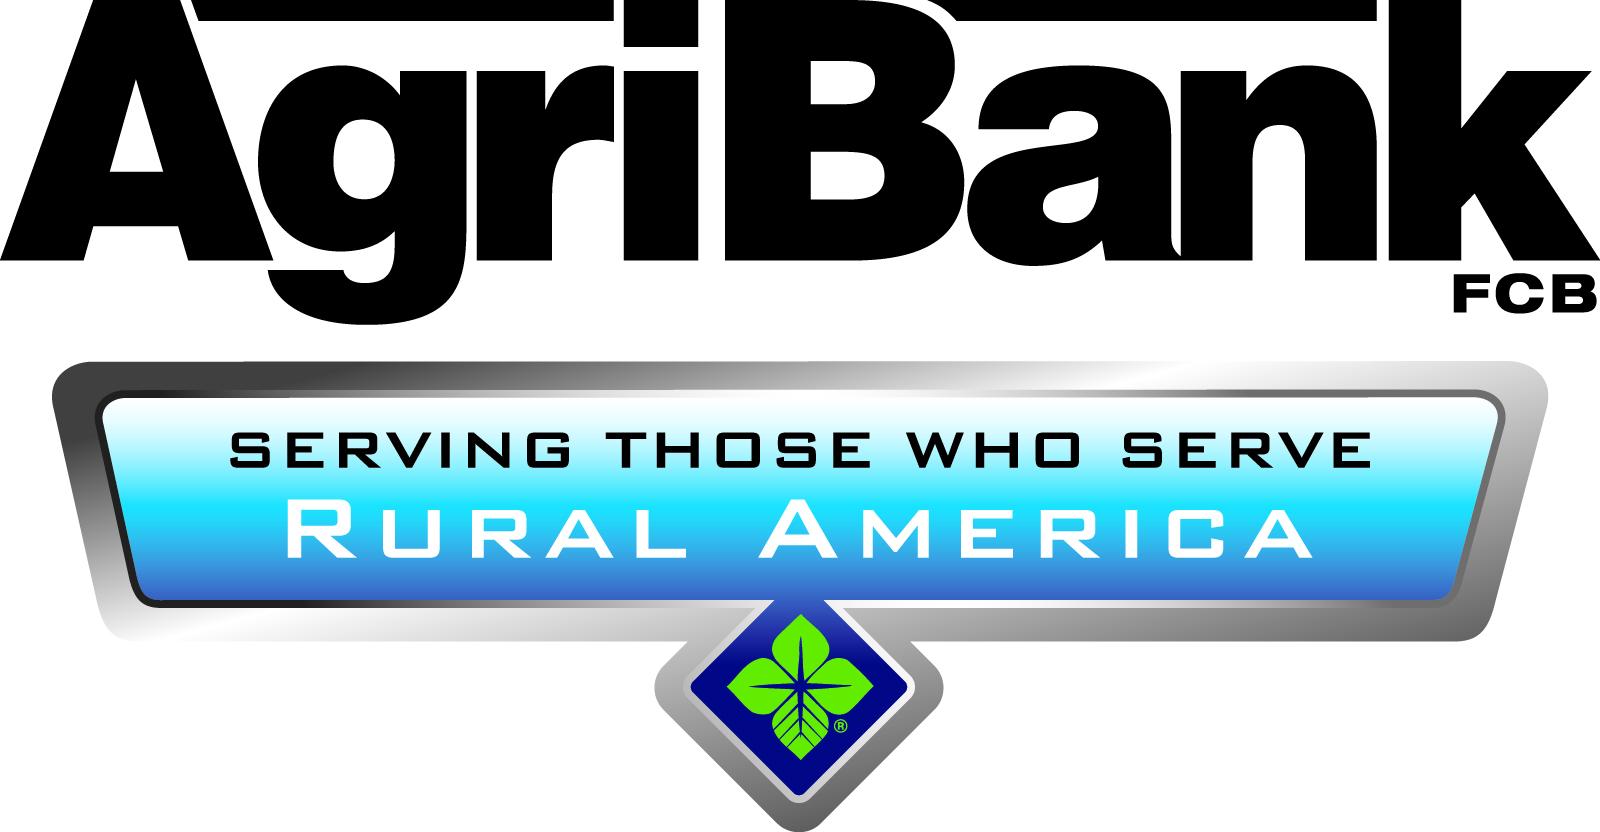 Agribank: AgriBank FCB. Web Search Vietnam